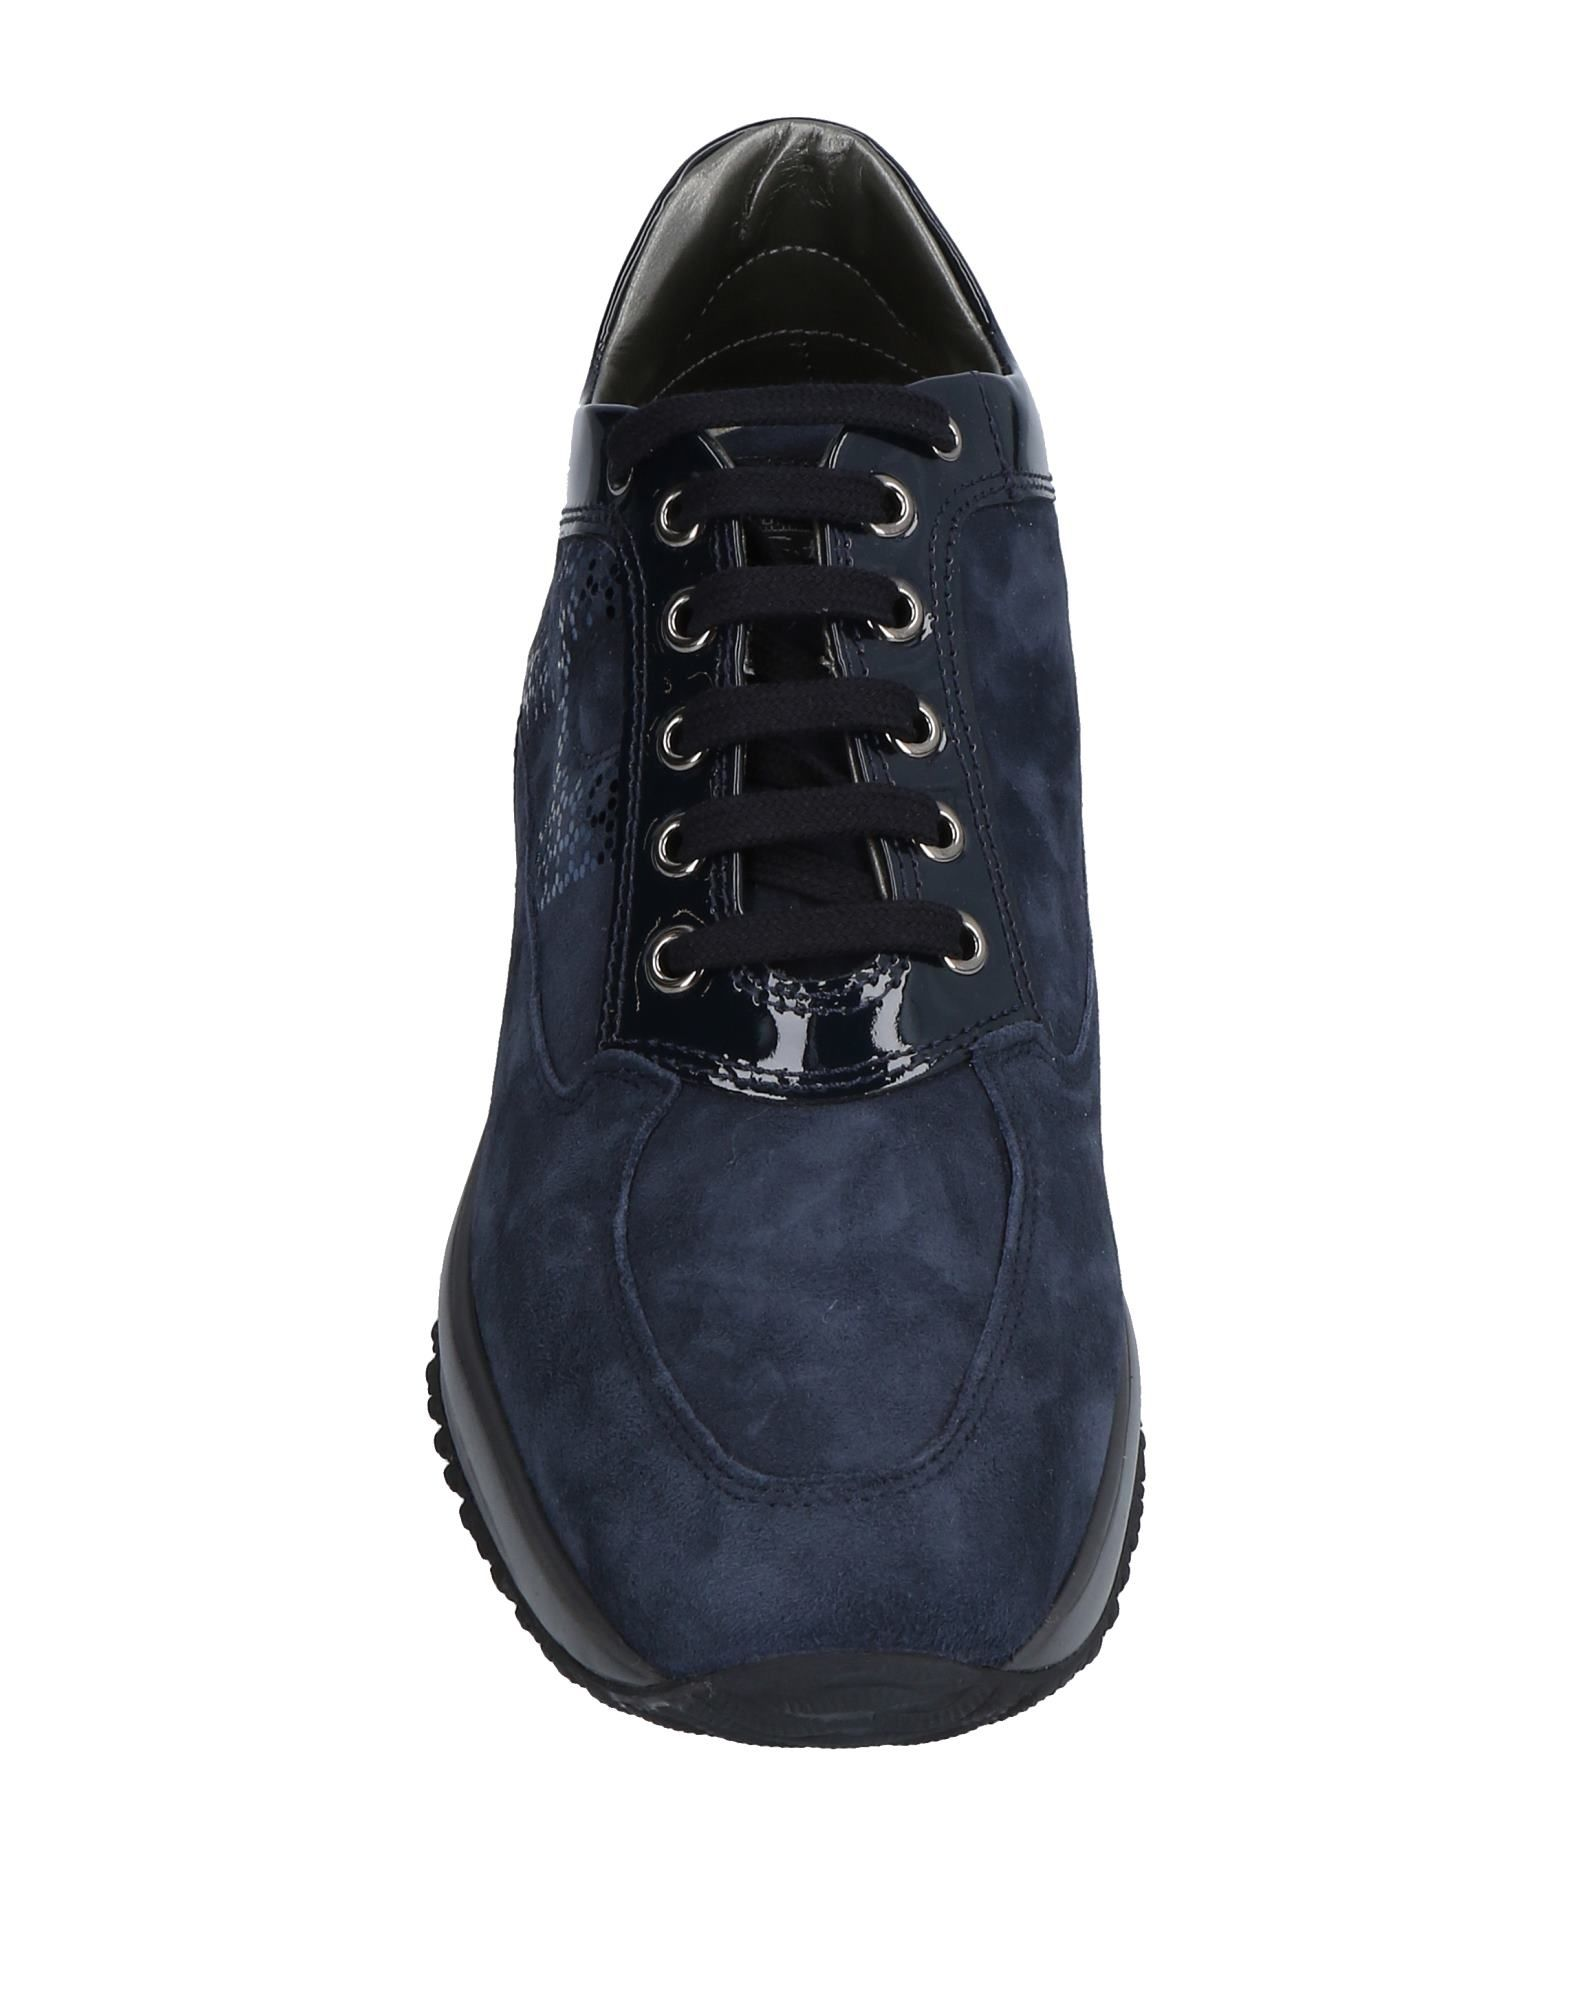 Rabatt Schuhe 11518386QE Hogan Sneakers Damen  11518386QE Schuhe af8cb3